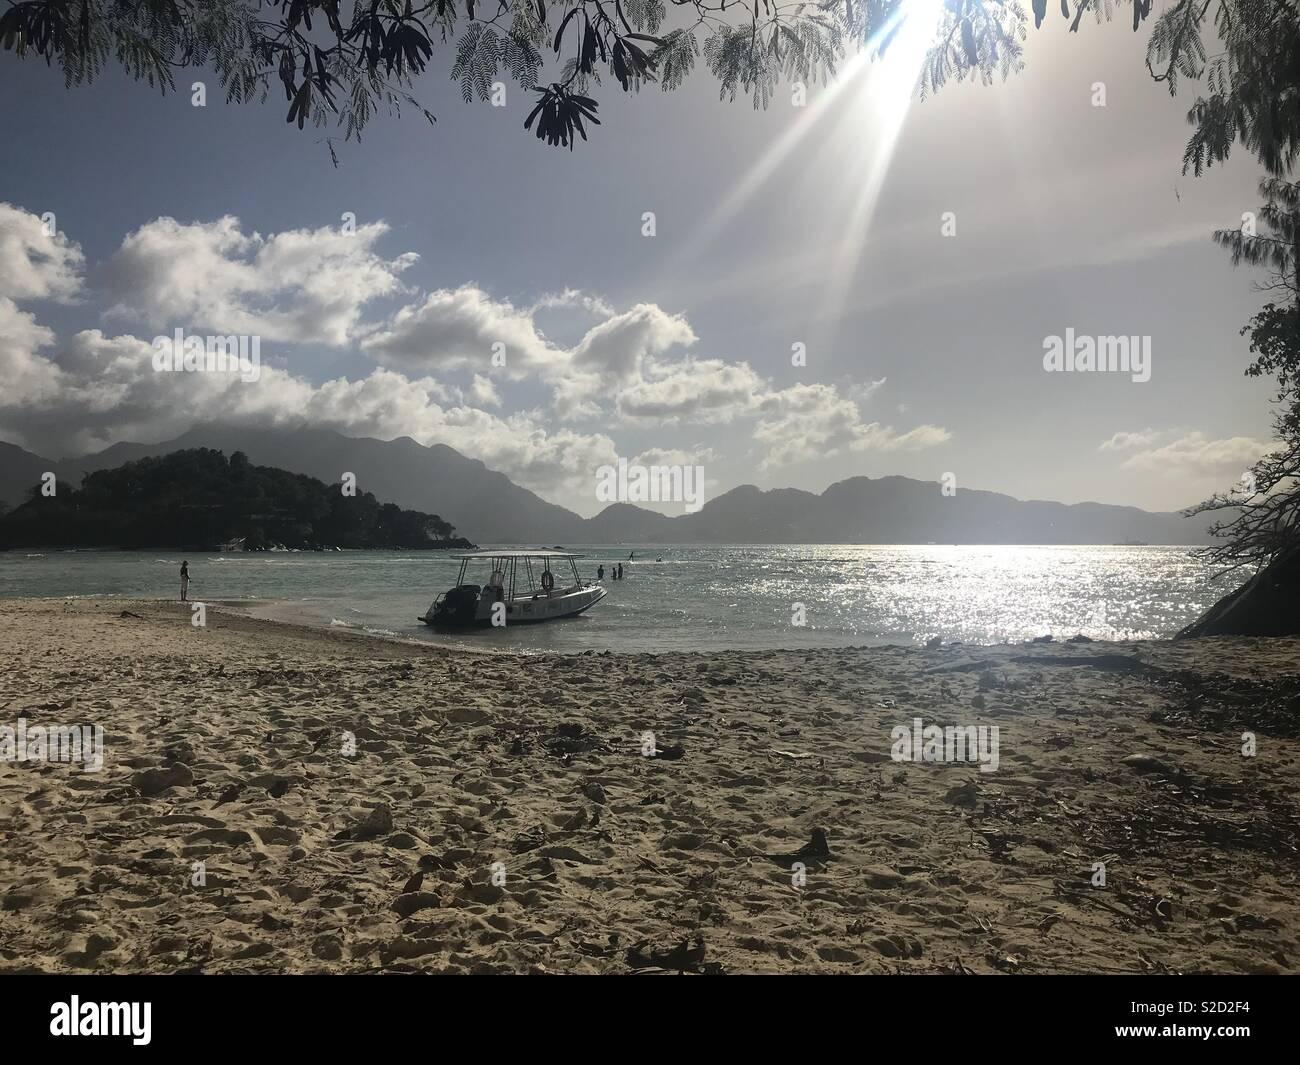 Beach boat trips - Stock Image